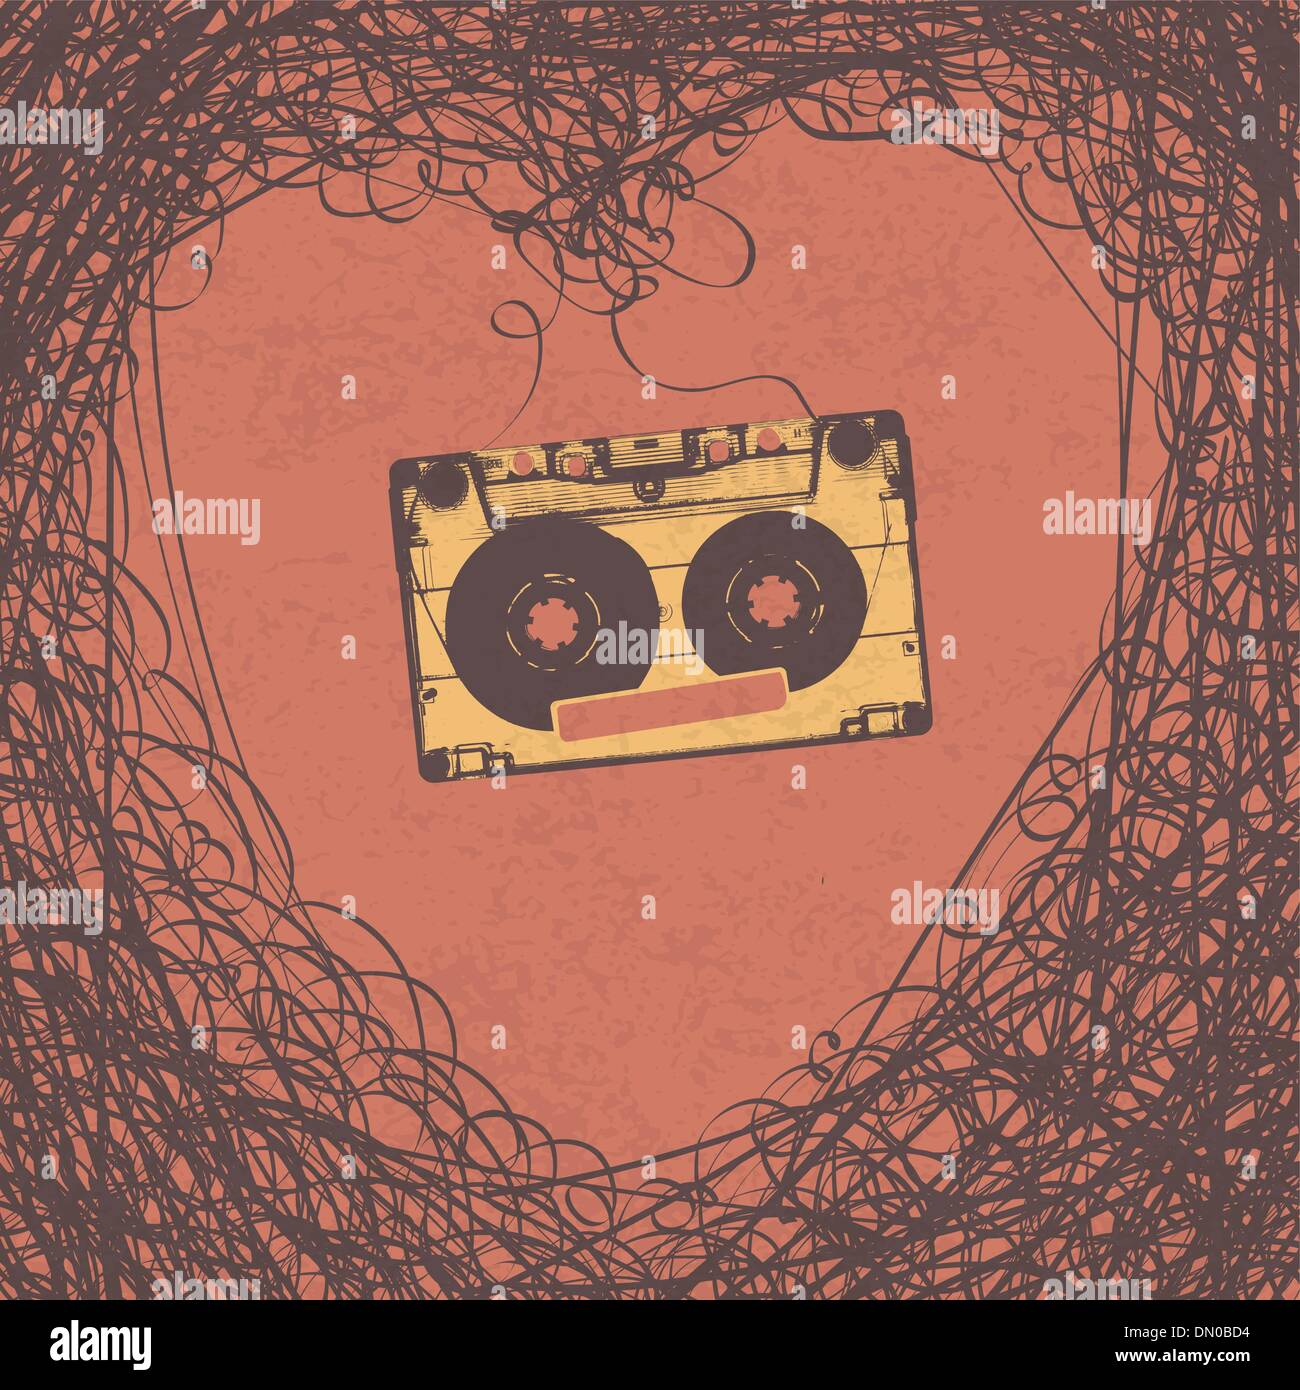 Loving retro music retro poster design. Vector, EPS10 - Stock Image